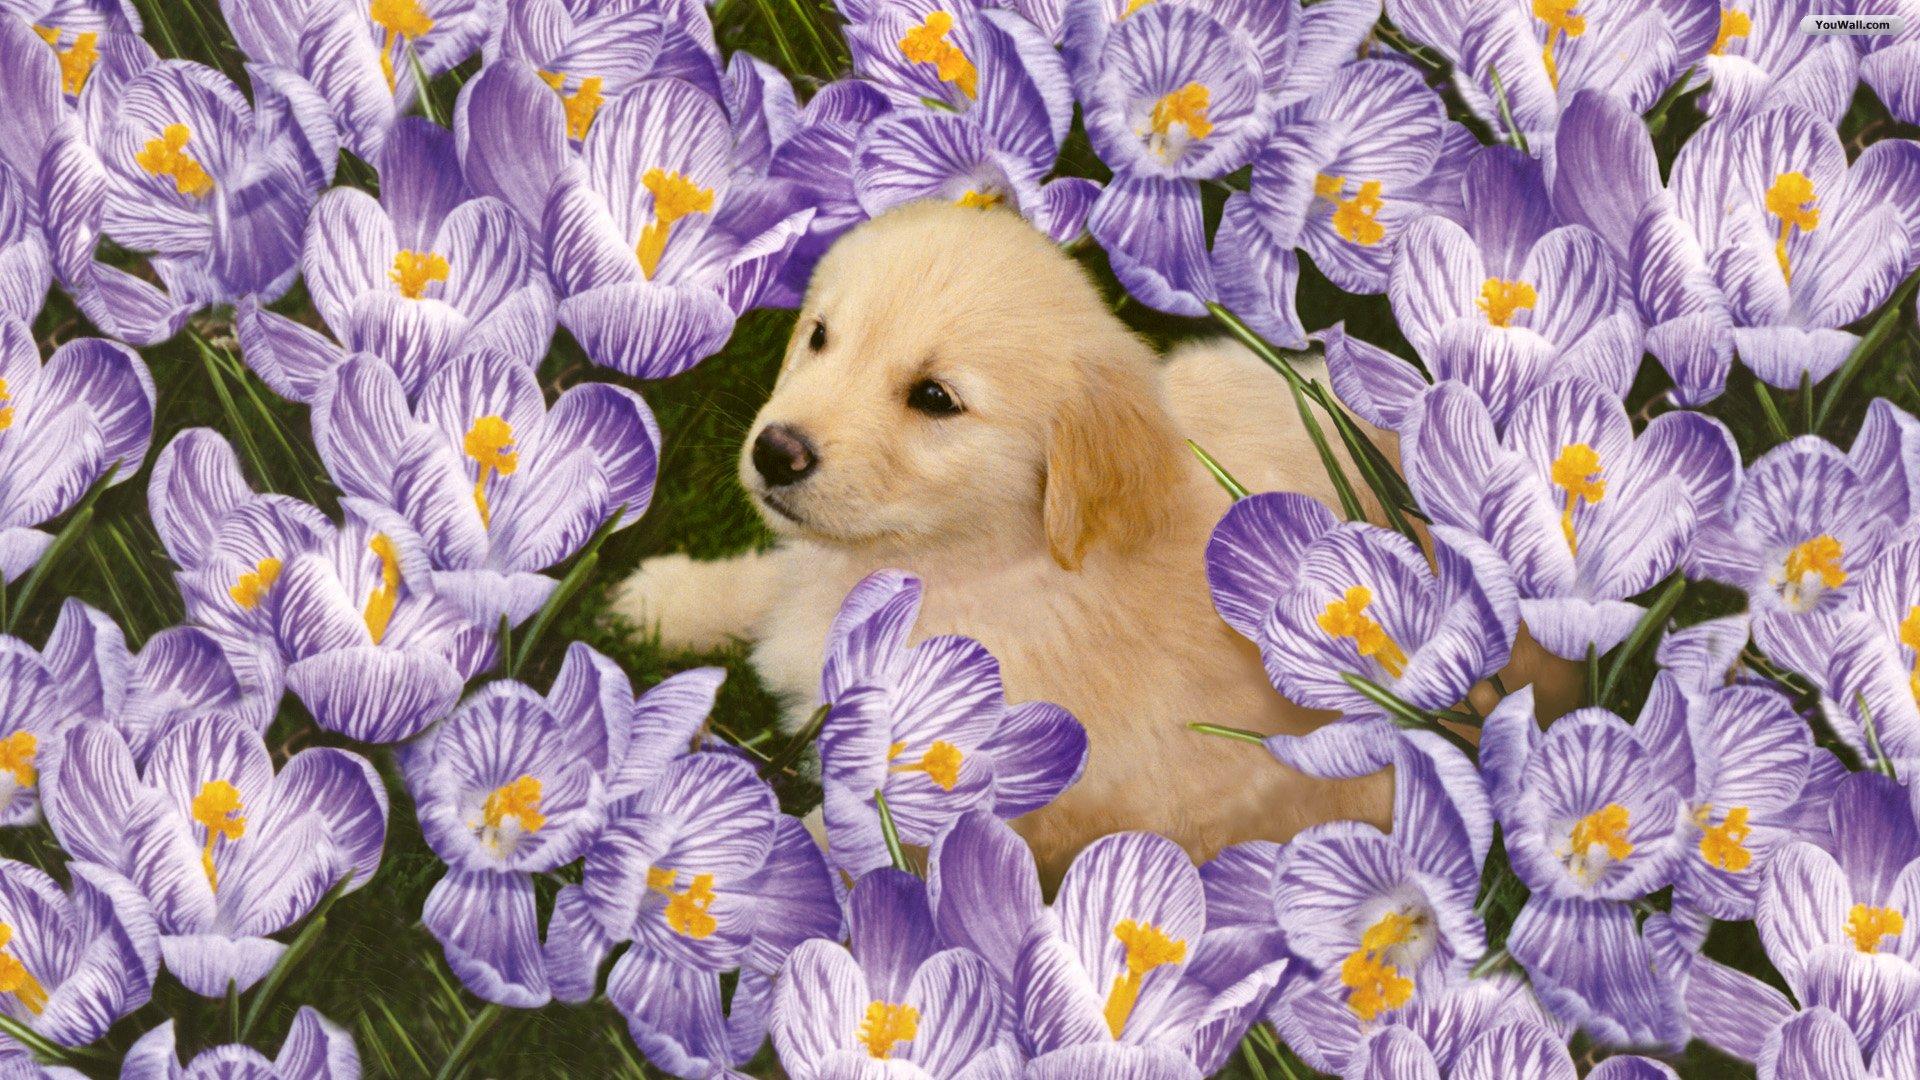 cute pics of flowers  wallpaper hd, Natural flower